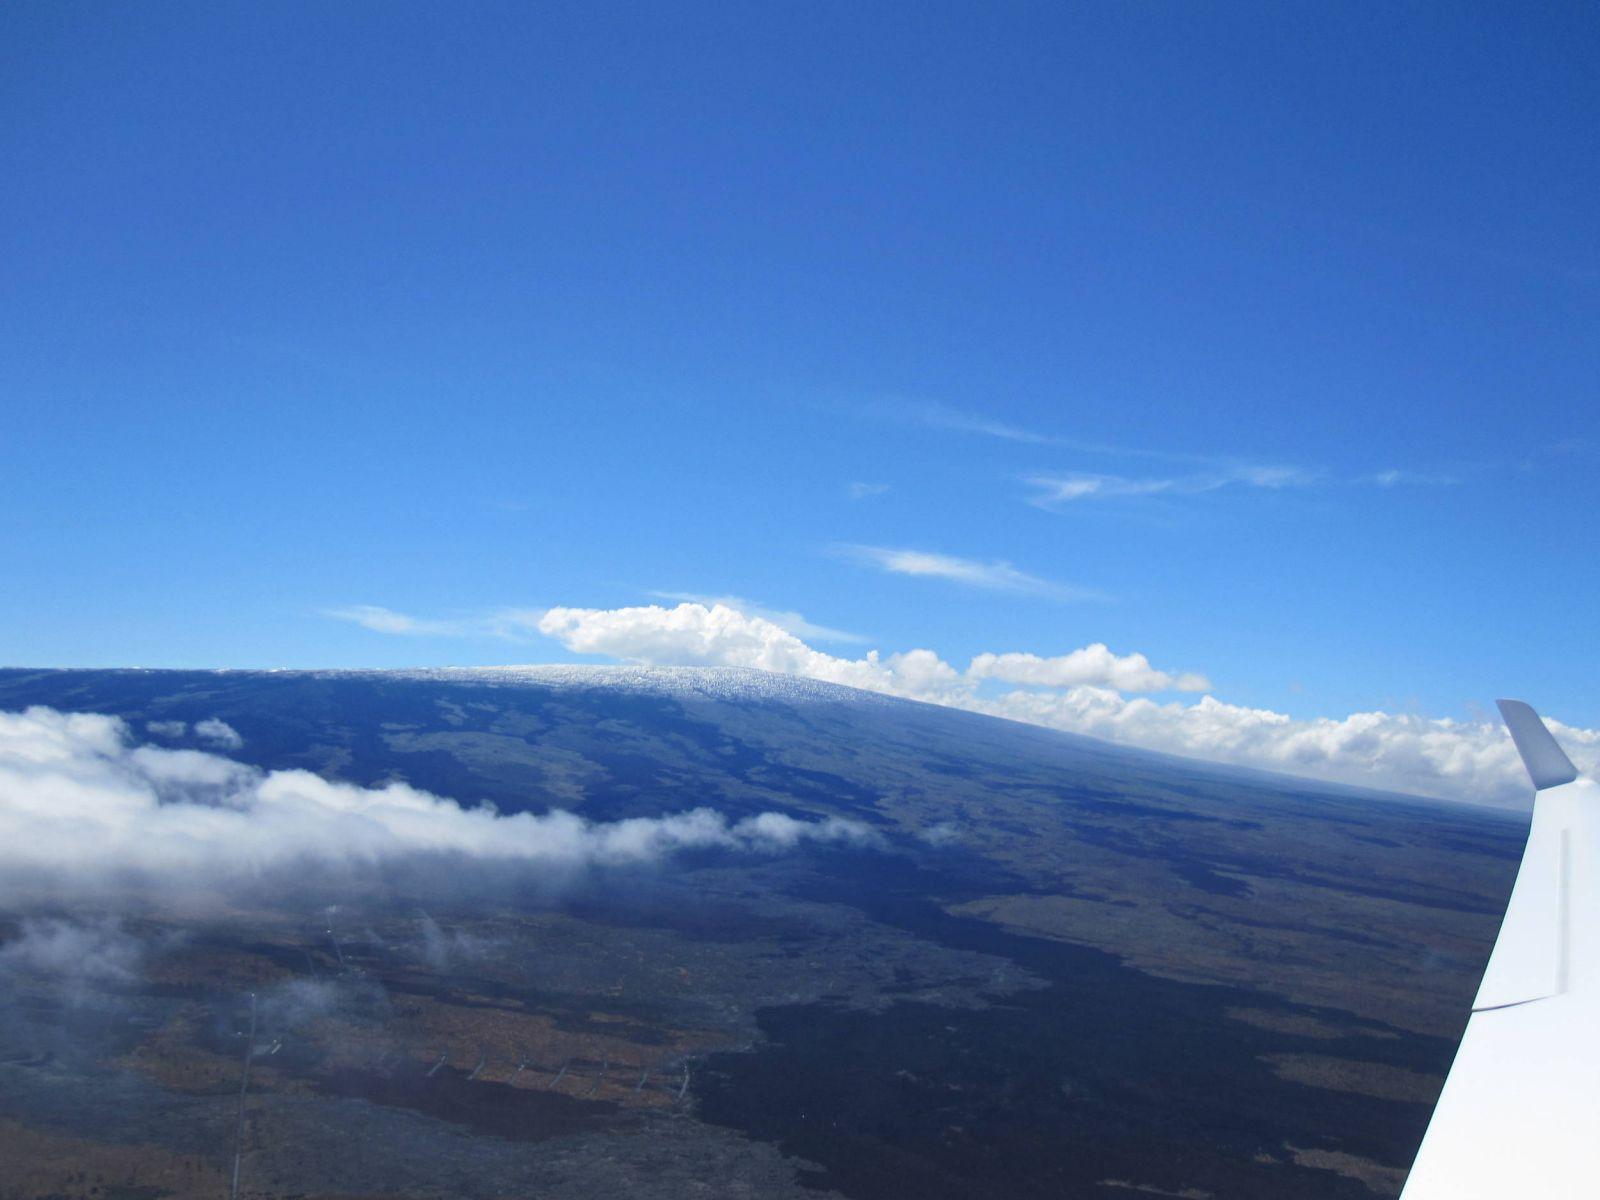 View toward Mauna Loa Mountain